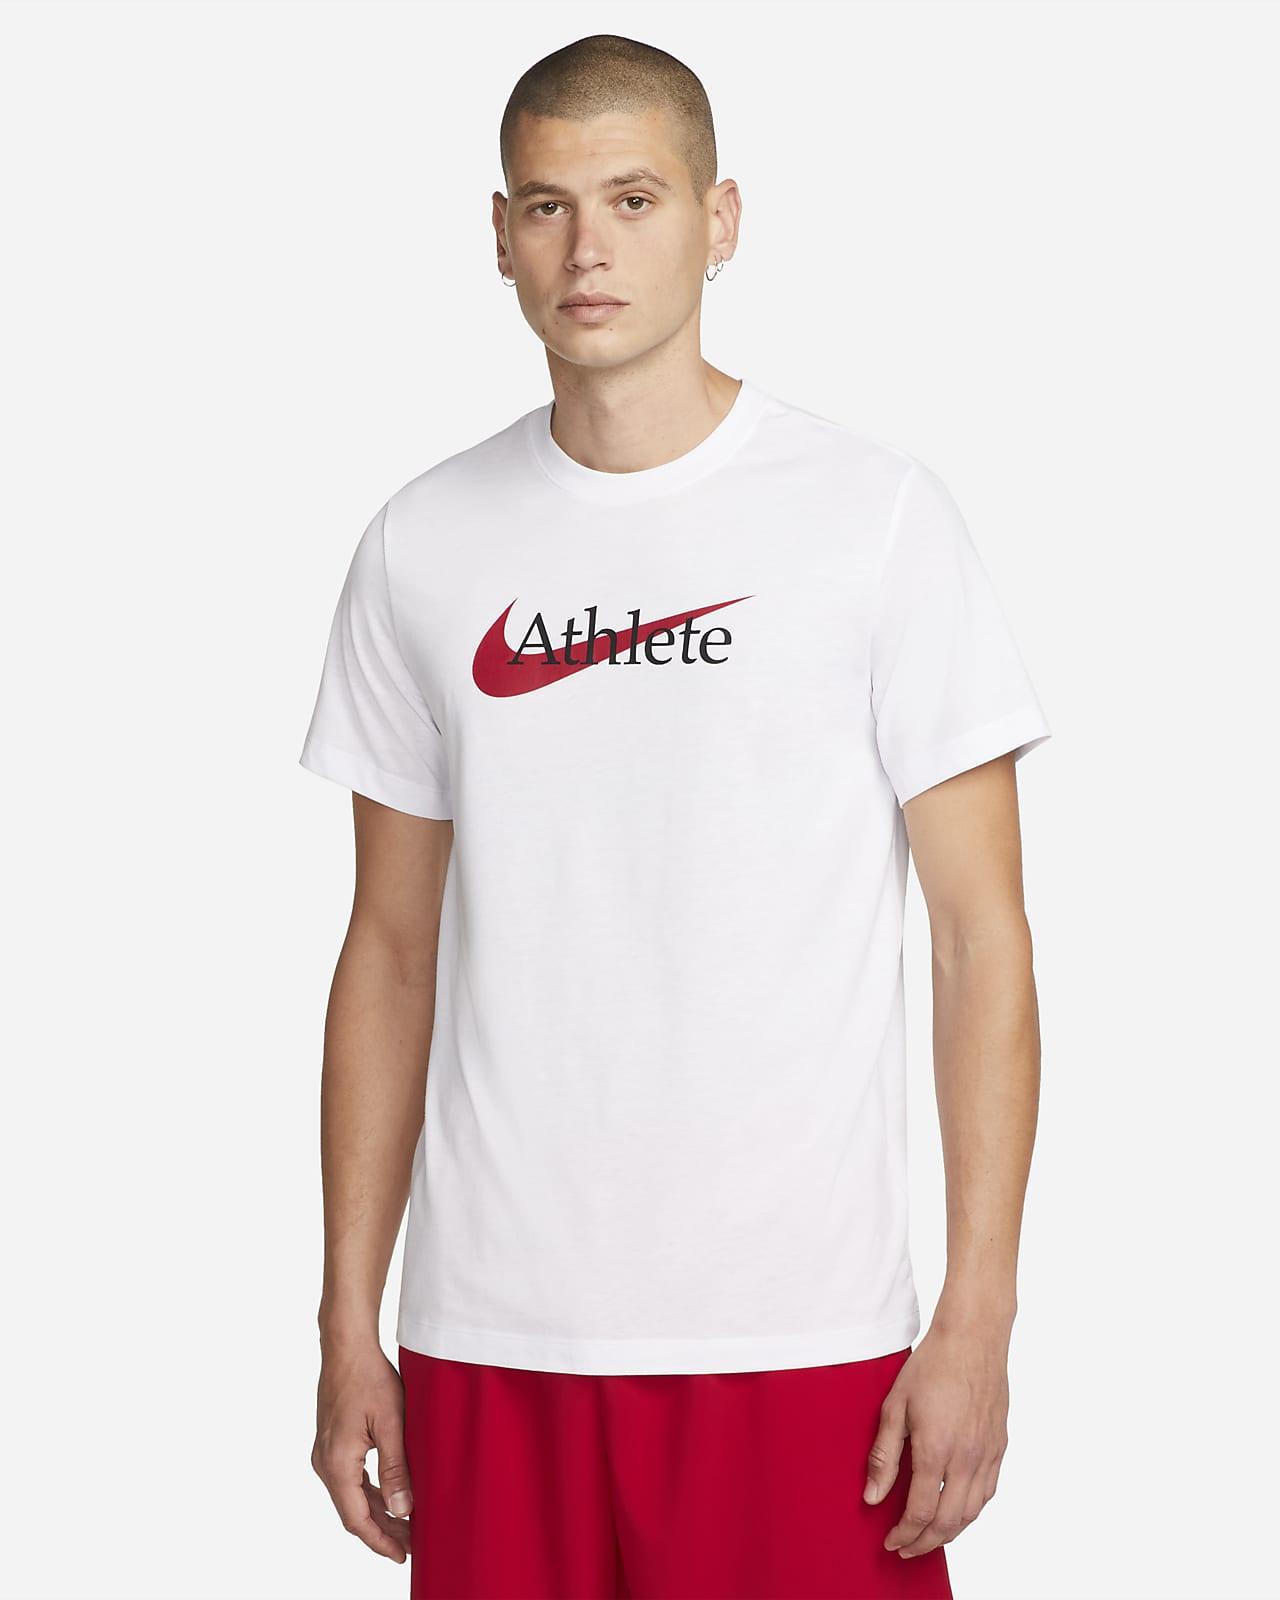 Мужская футболка для тренинга с логотипом Swoosh Nike Dri-FIT